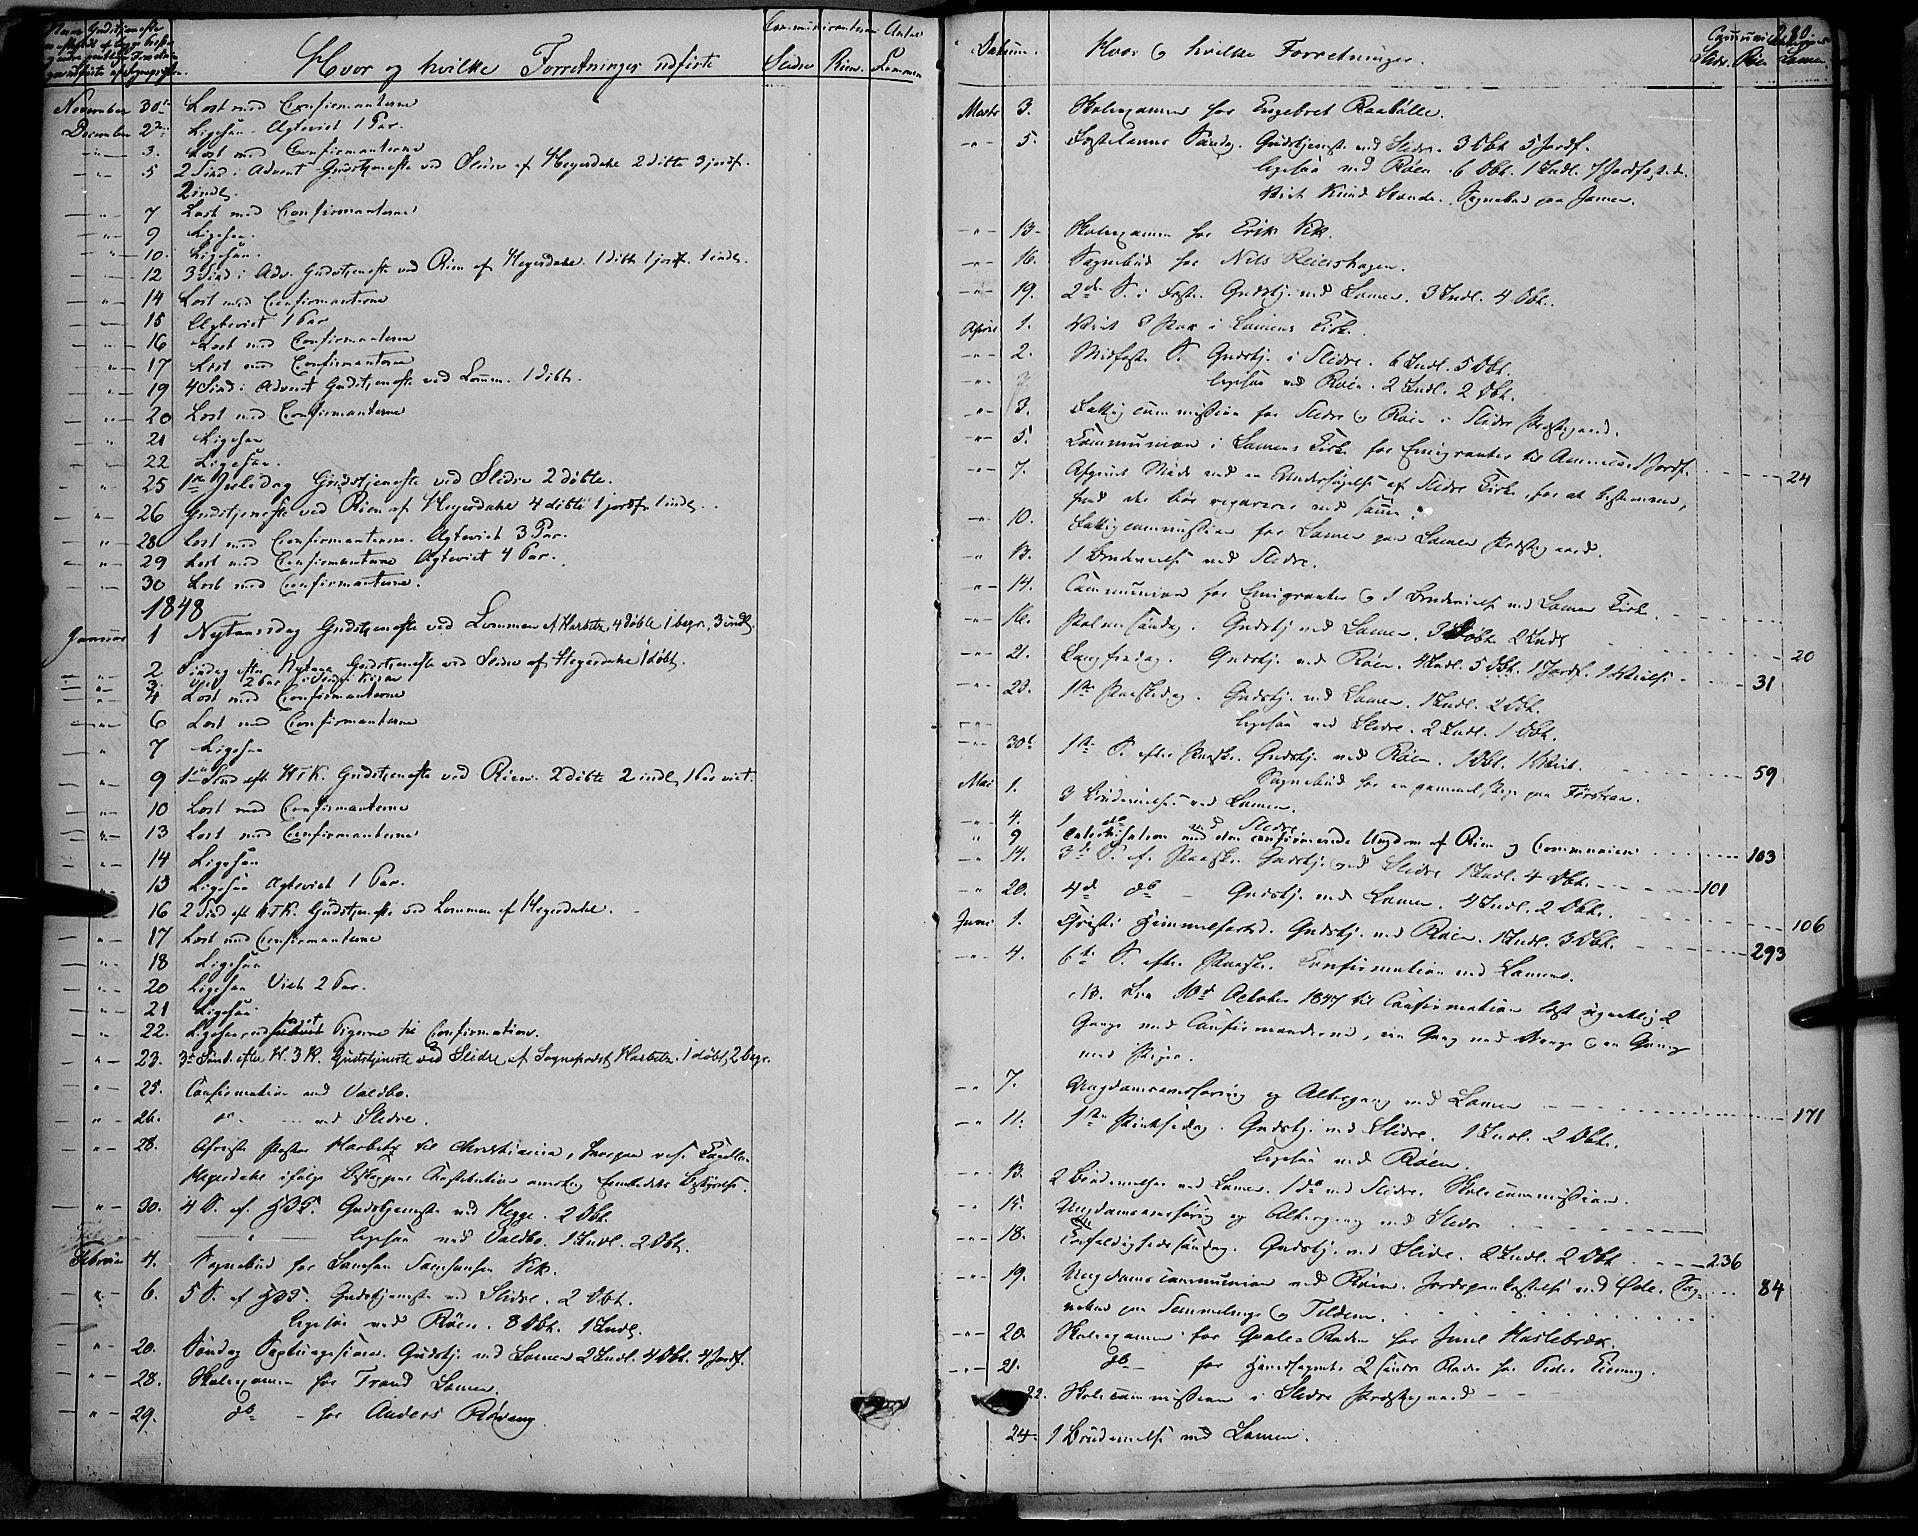 SAH, Vestre Slidre prestekontor, Ministerialbok nr. 1, 1844-1855, s. 280